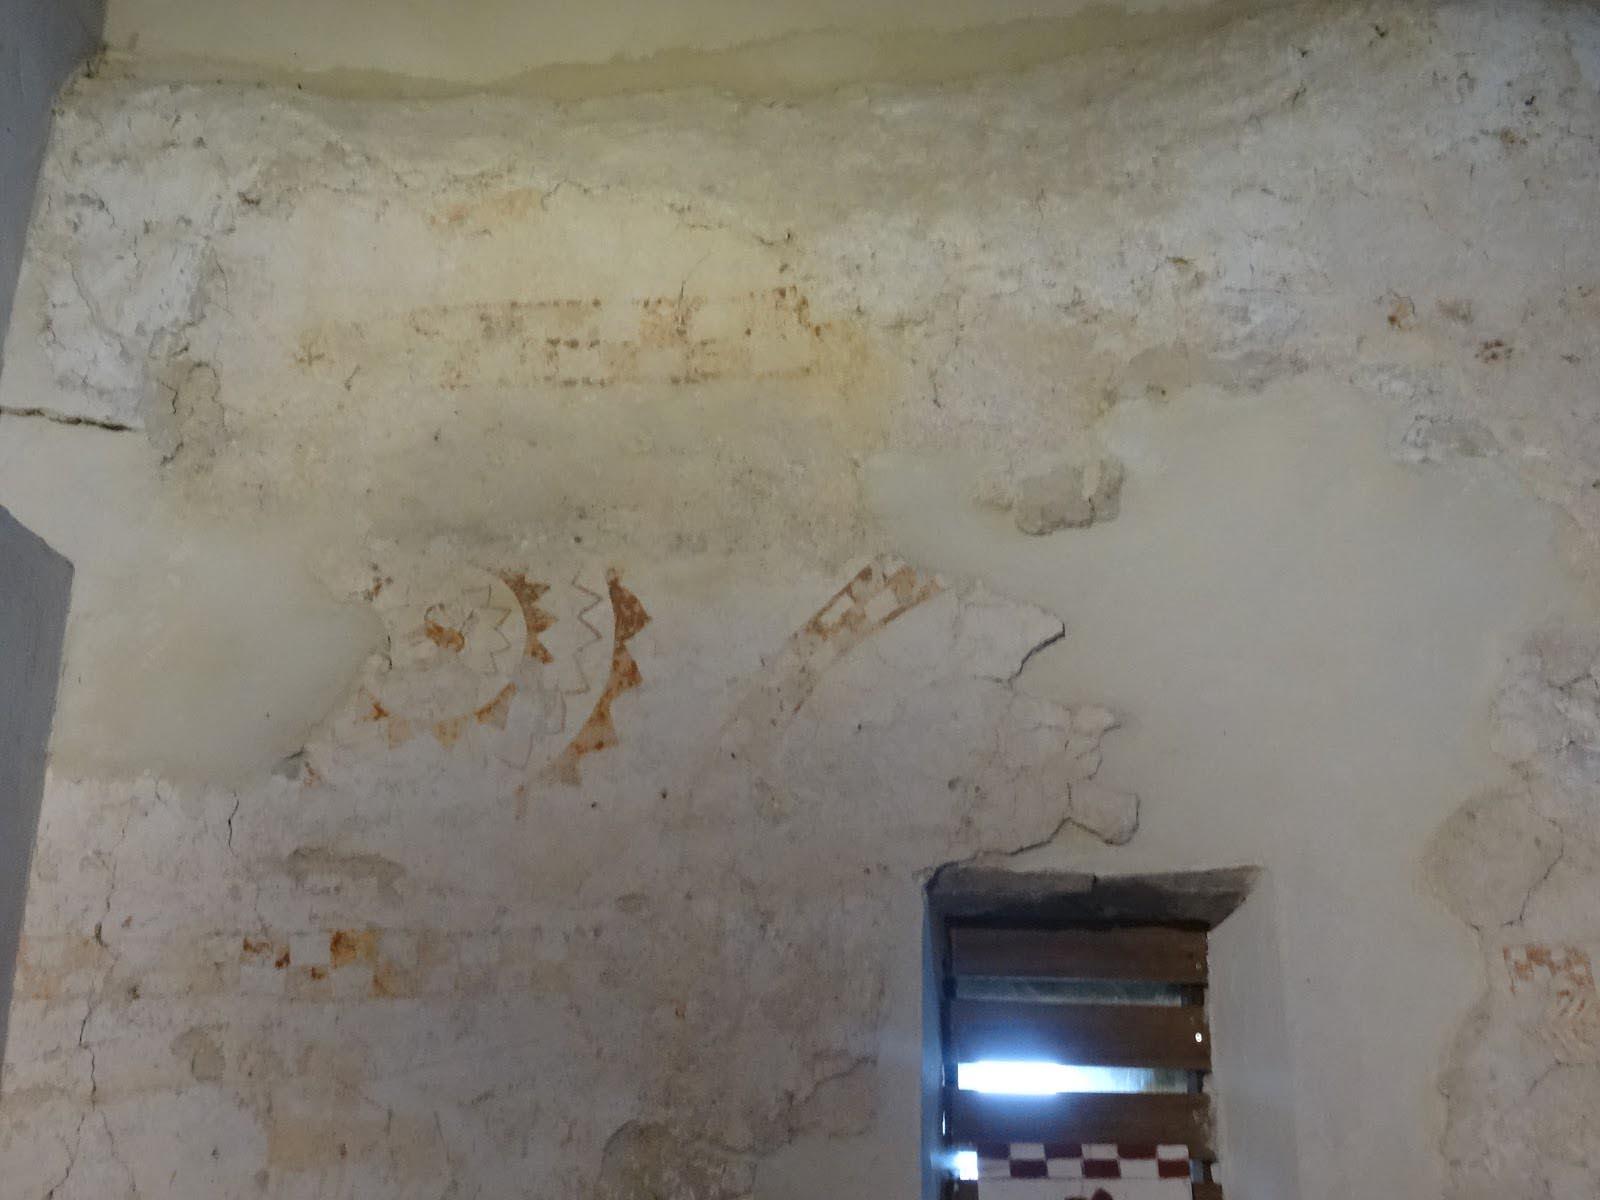 ermita-de-san-pantaleon-de-losa-interior-frescos